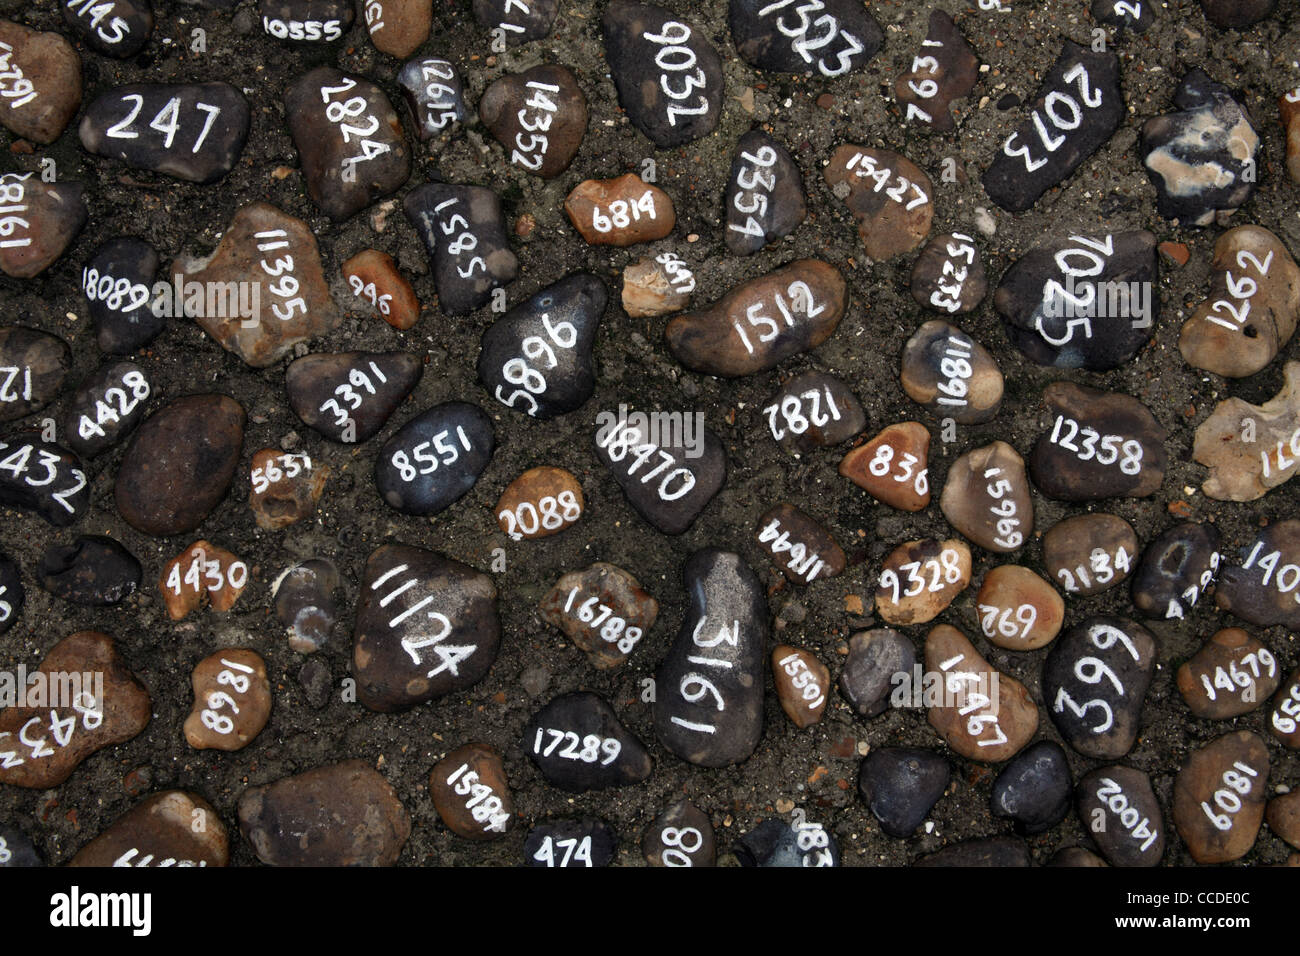 Installation by Mark Wallinger in Folkestone, Kent; entitled 'Folk Stones' - Stock Image